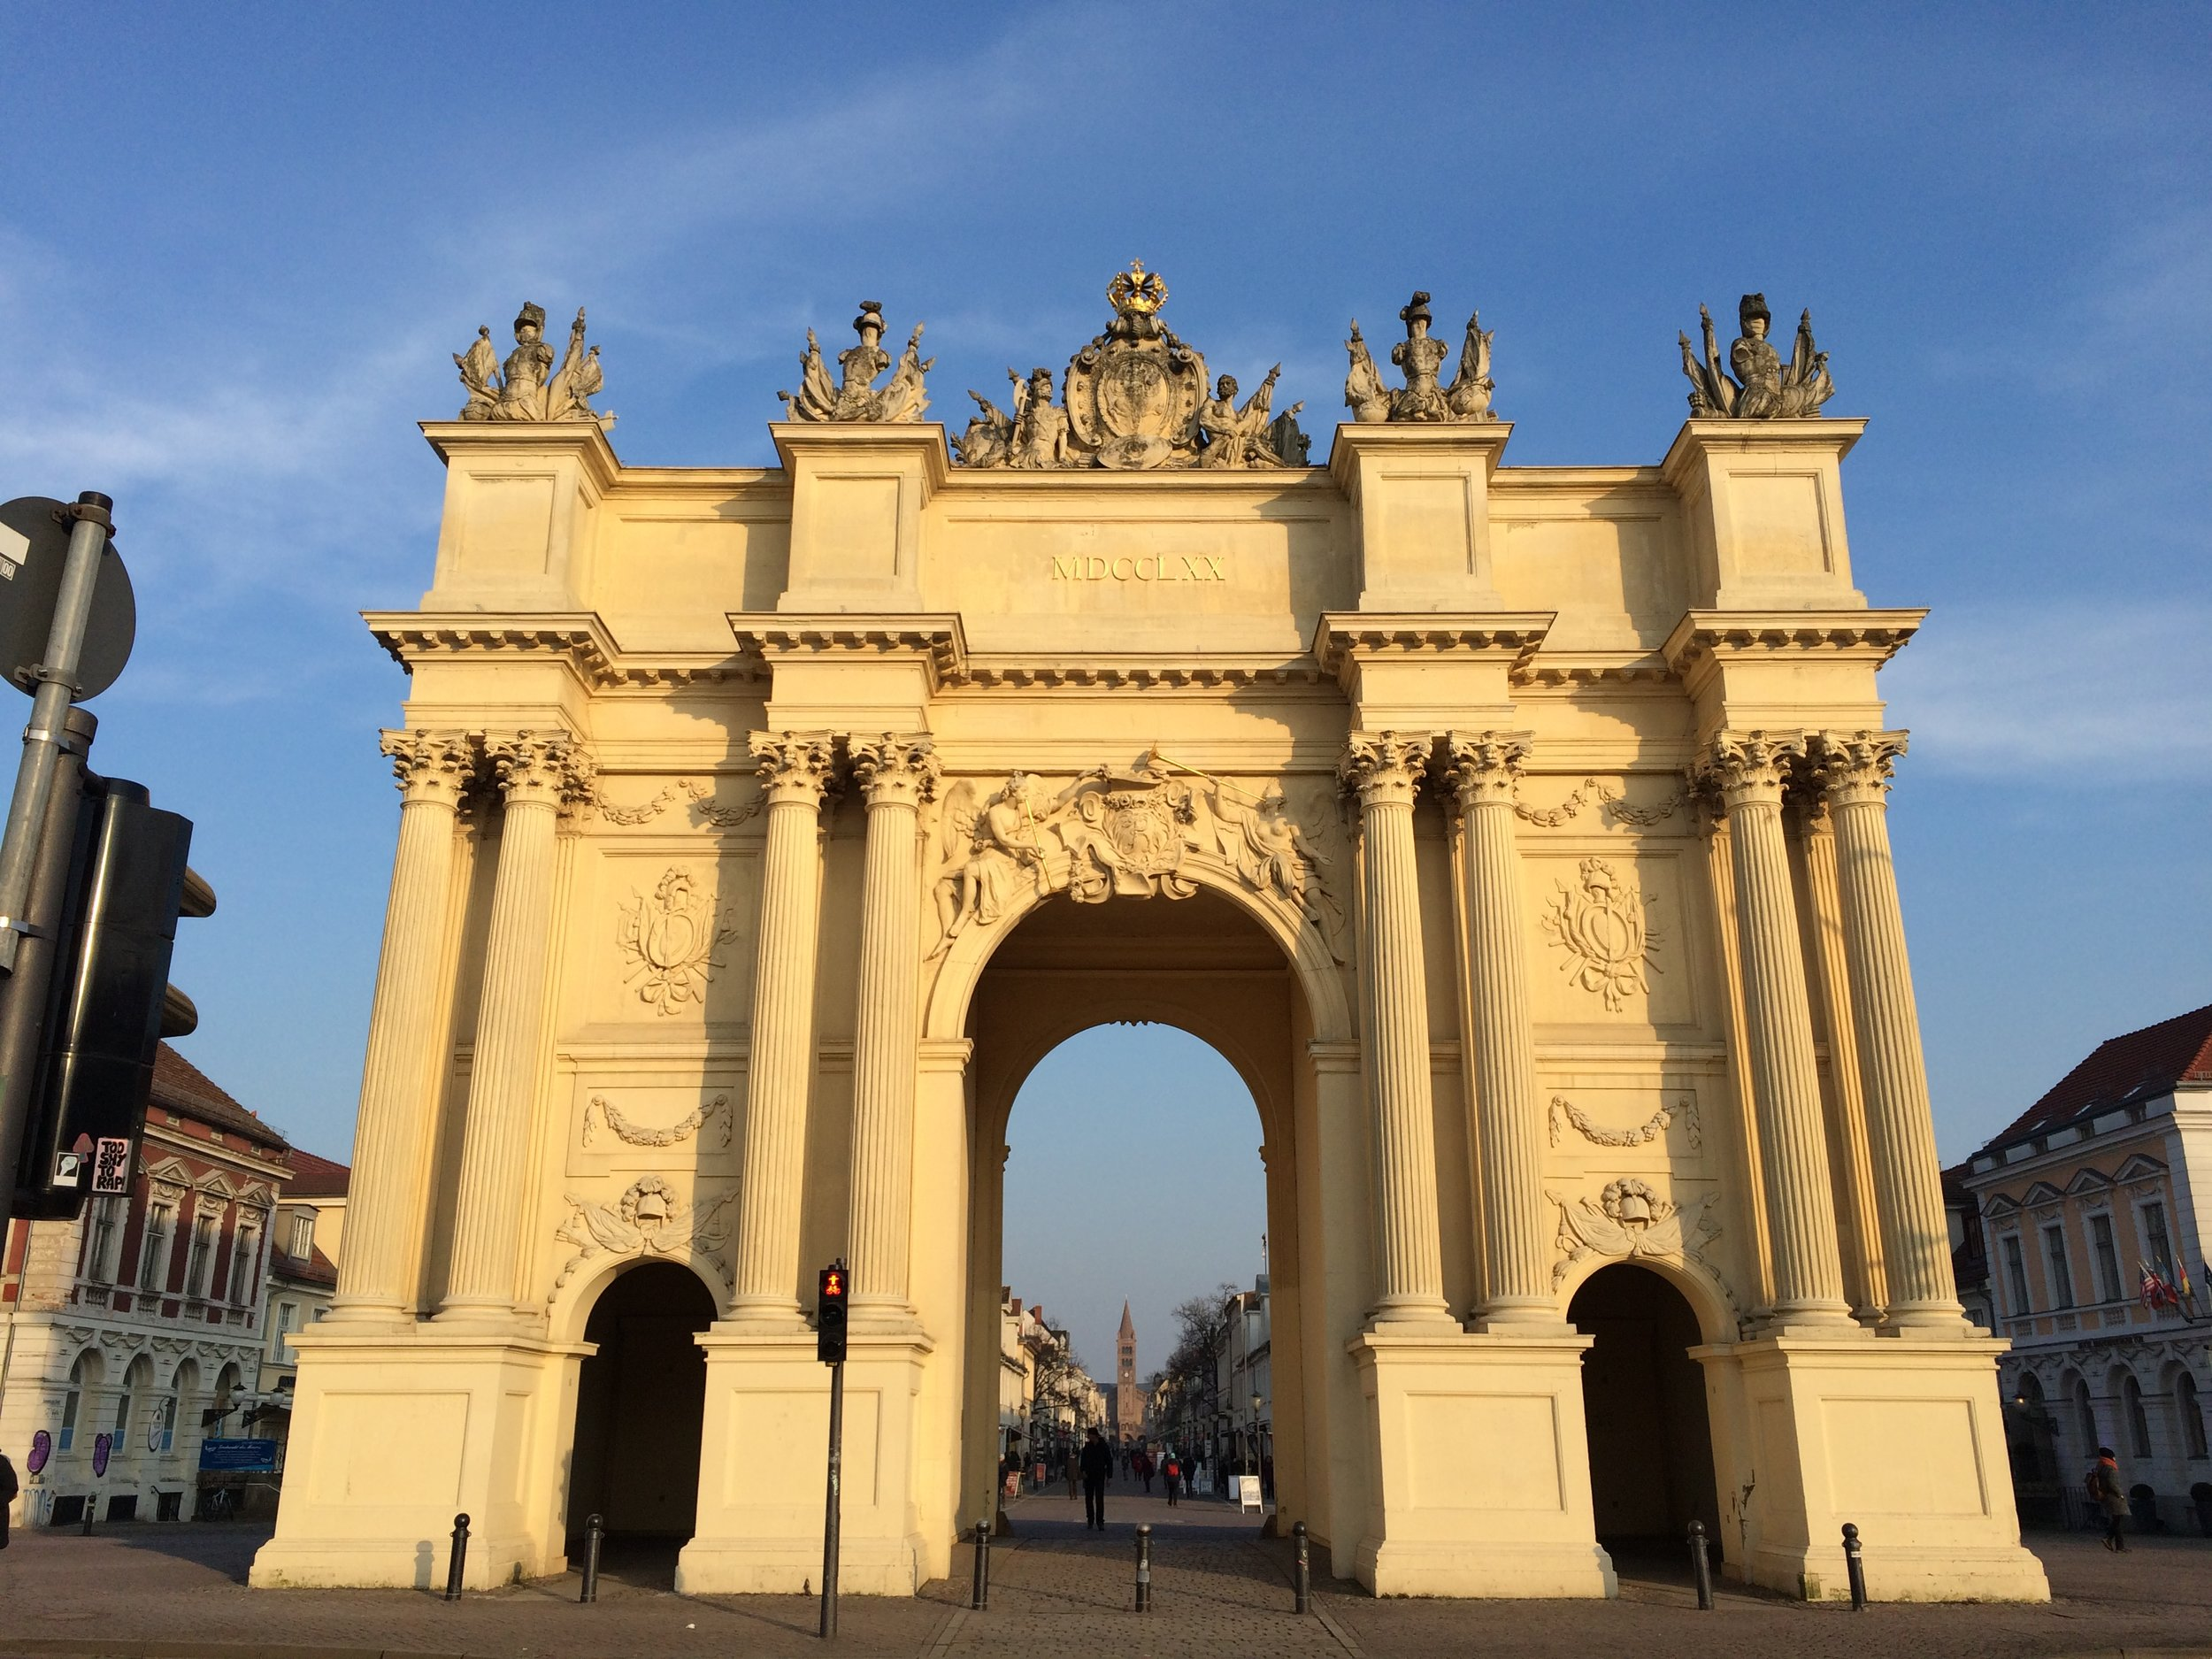 Potsdam gate